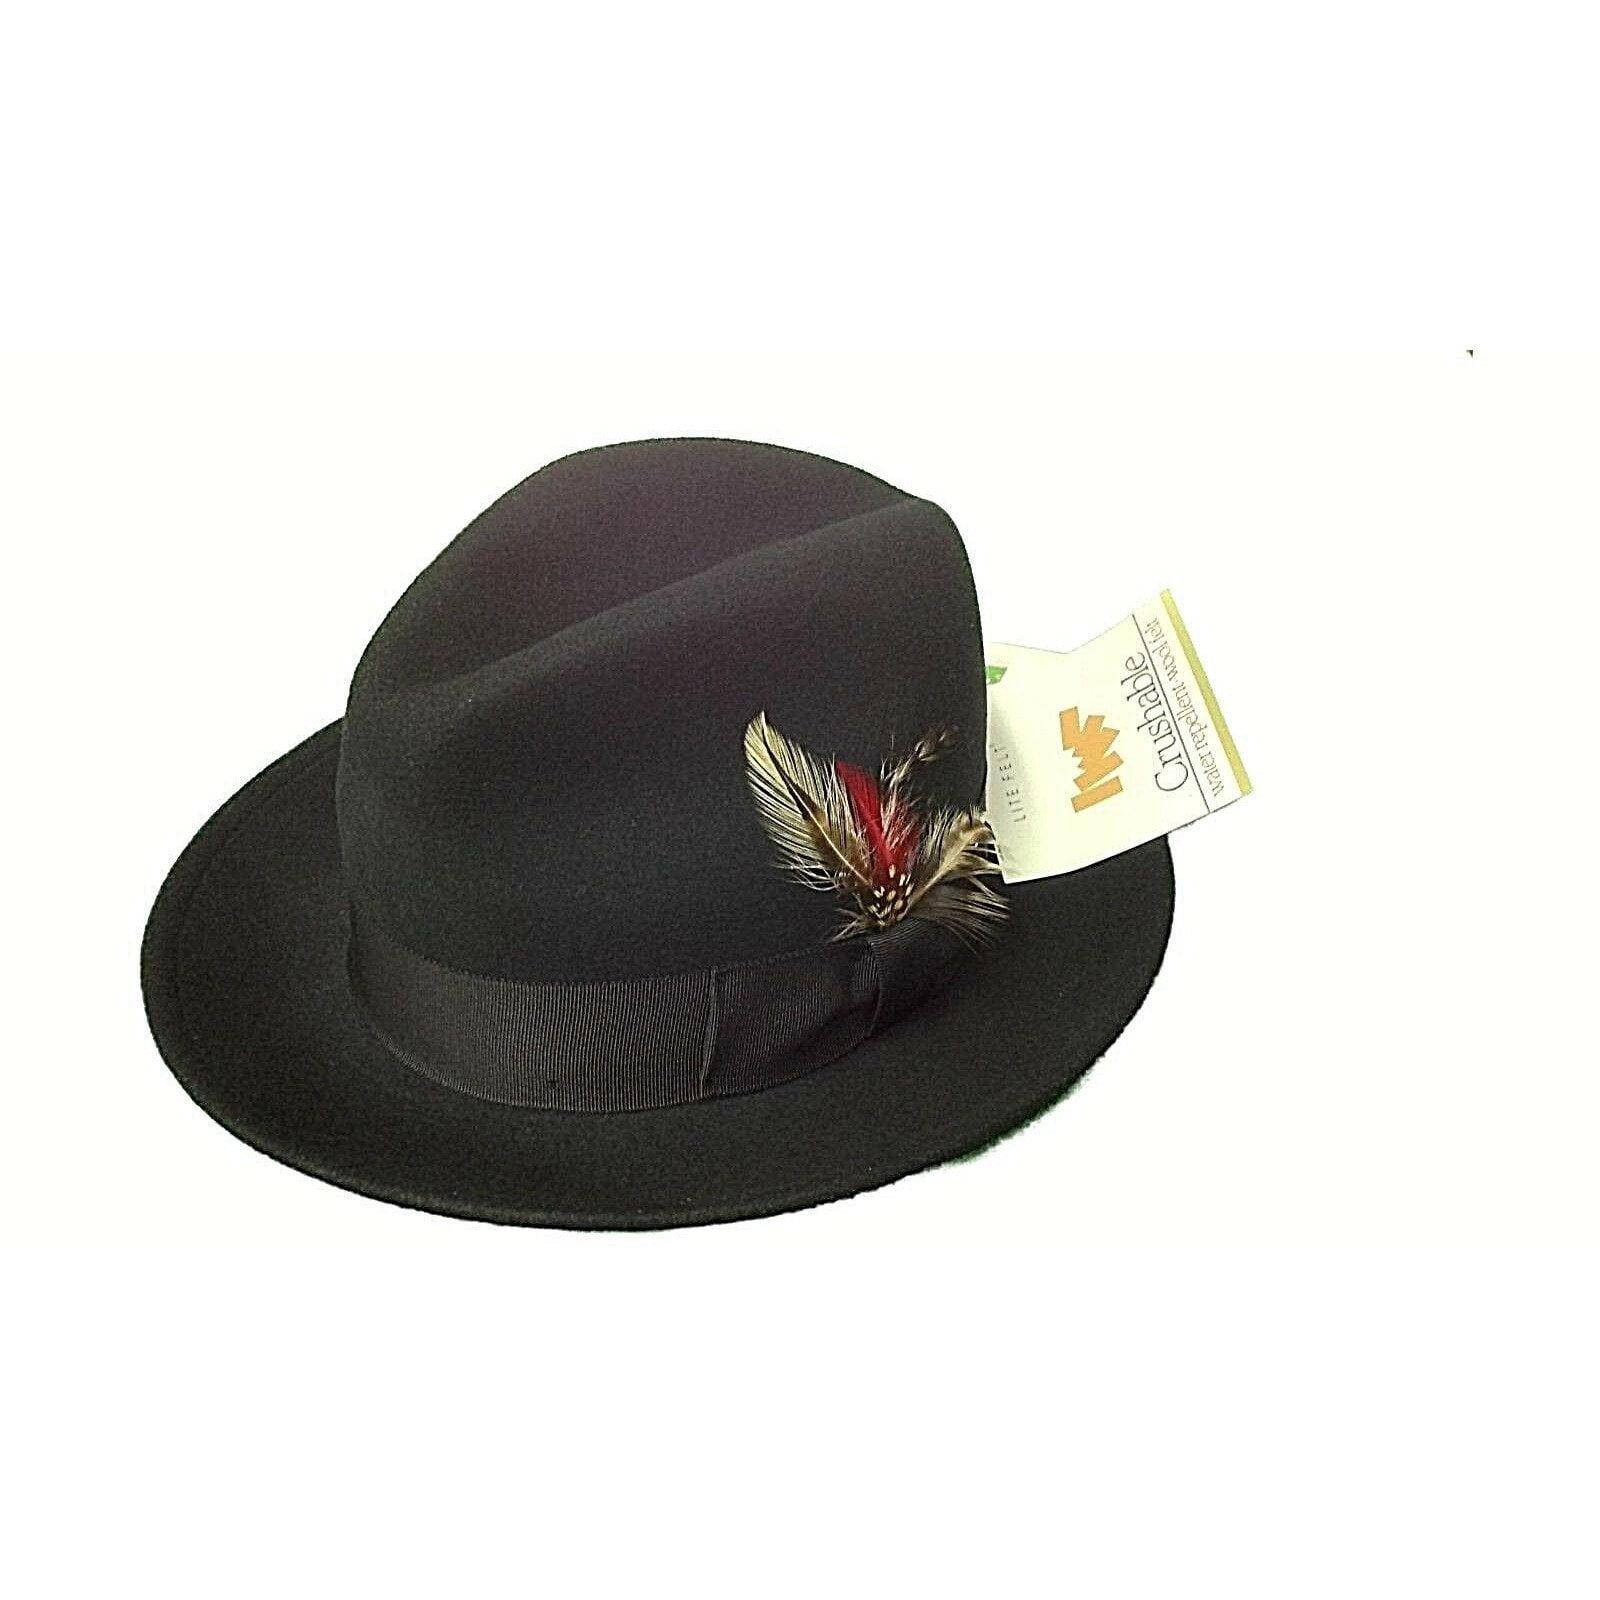 Men Fedora Hat BRONER Crushable Water repellent Soft Wool Above the rest Black